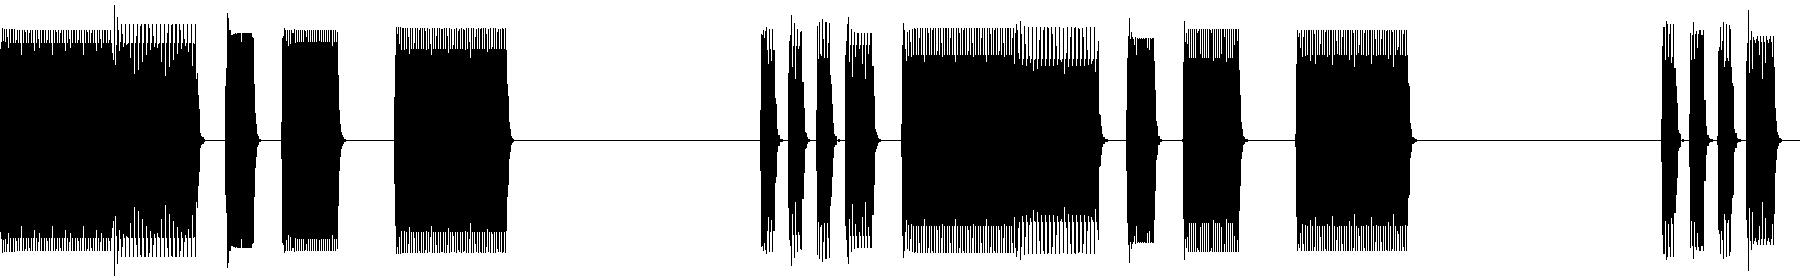 90 c 12